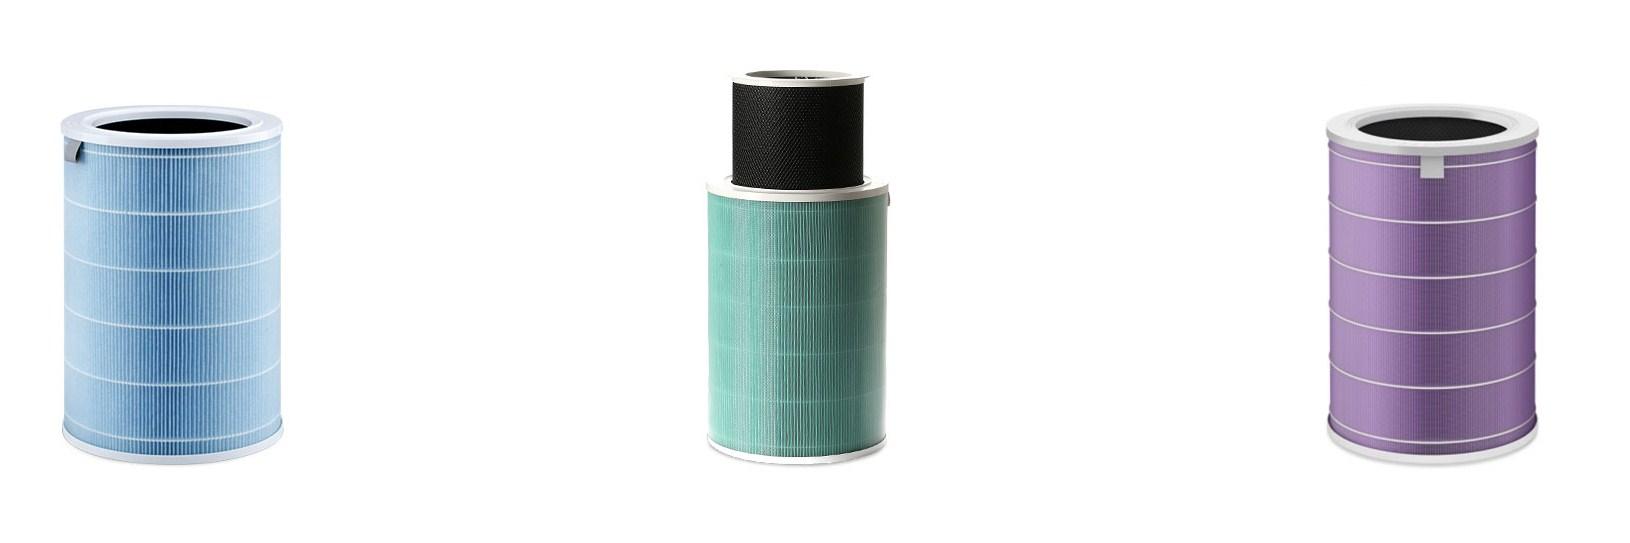 SmartMi Air Purifier 2S сменные фильтры